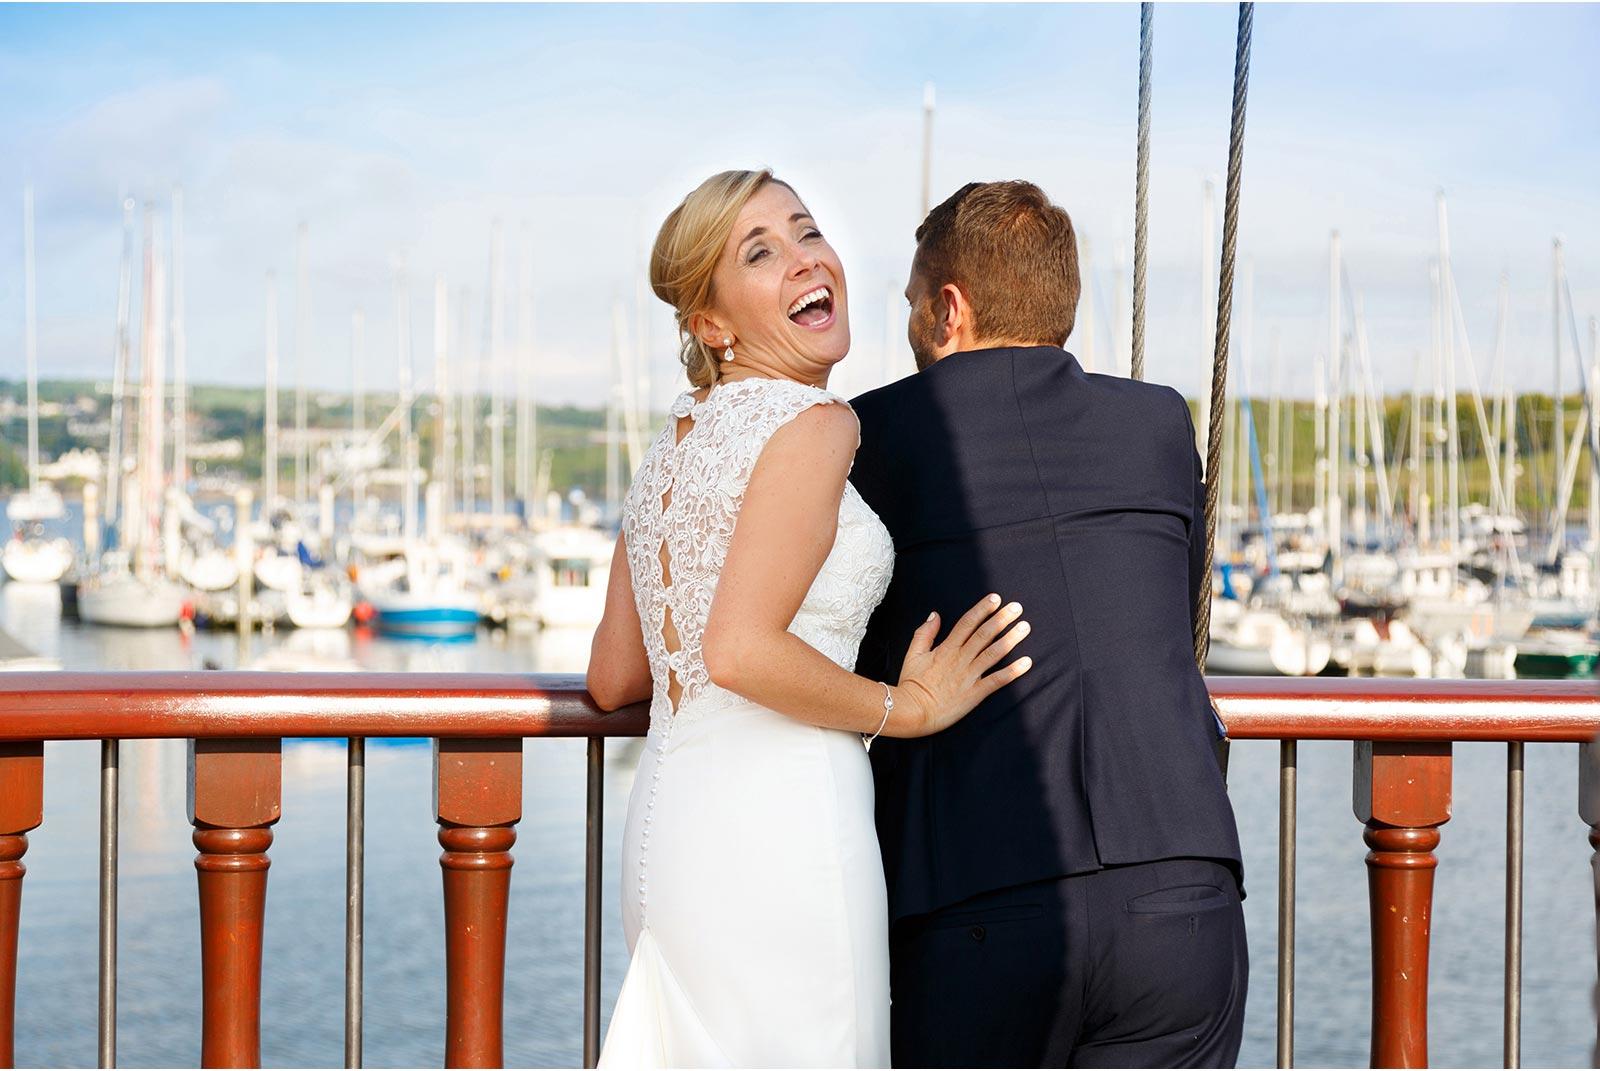 Kinsale wedding, Actons hotel Kinsale, Wedding fun